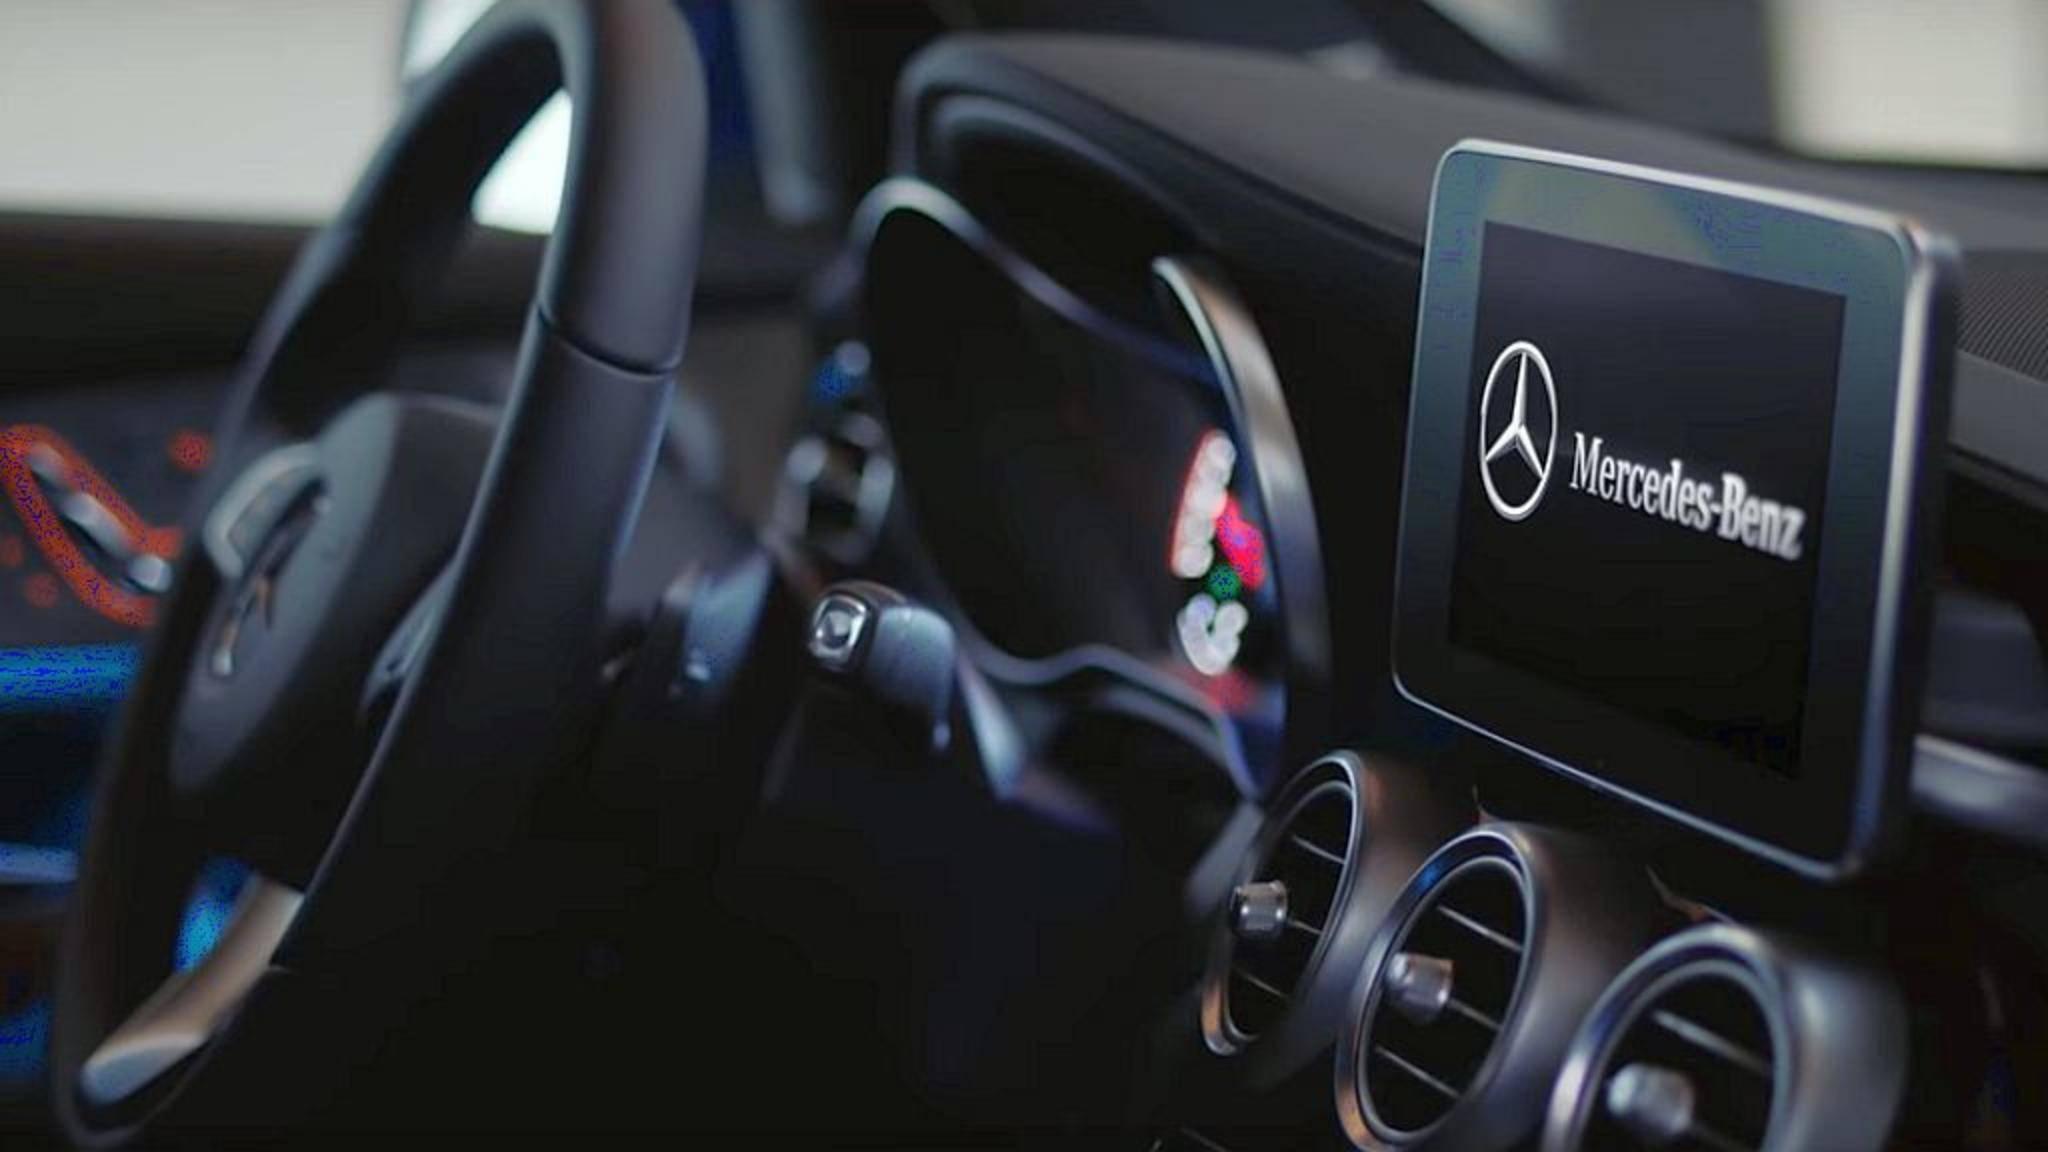 mercedes-benz-google-home-alexa-youtube-MercedesBenzTV